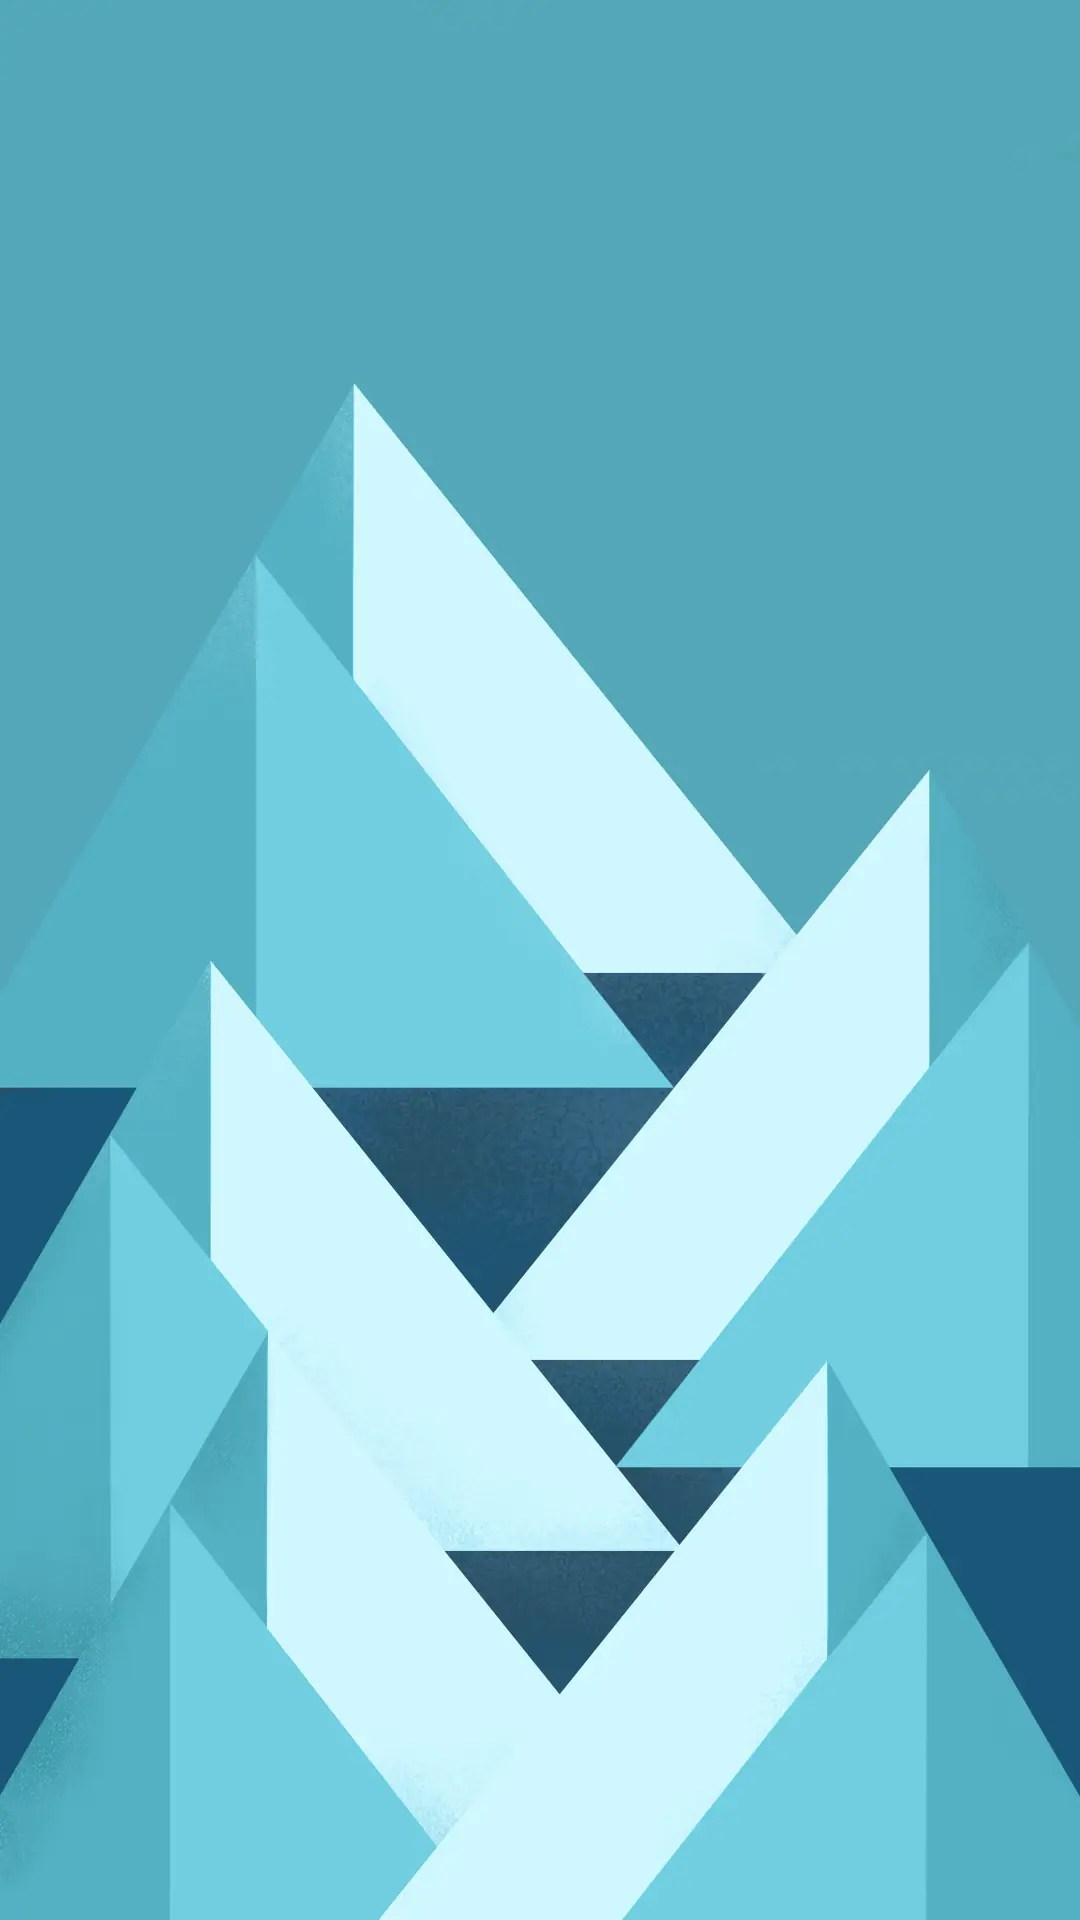 iceberg OnePlus 2 Wallpapers